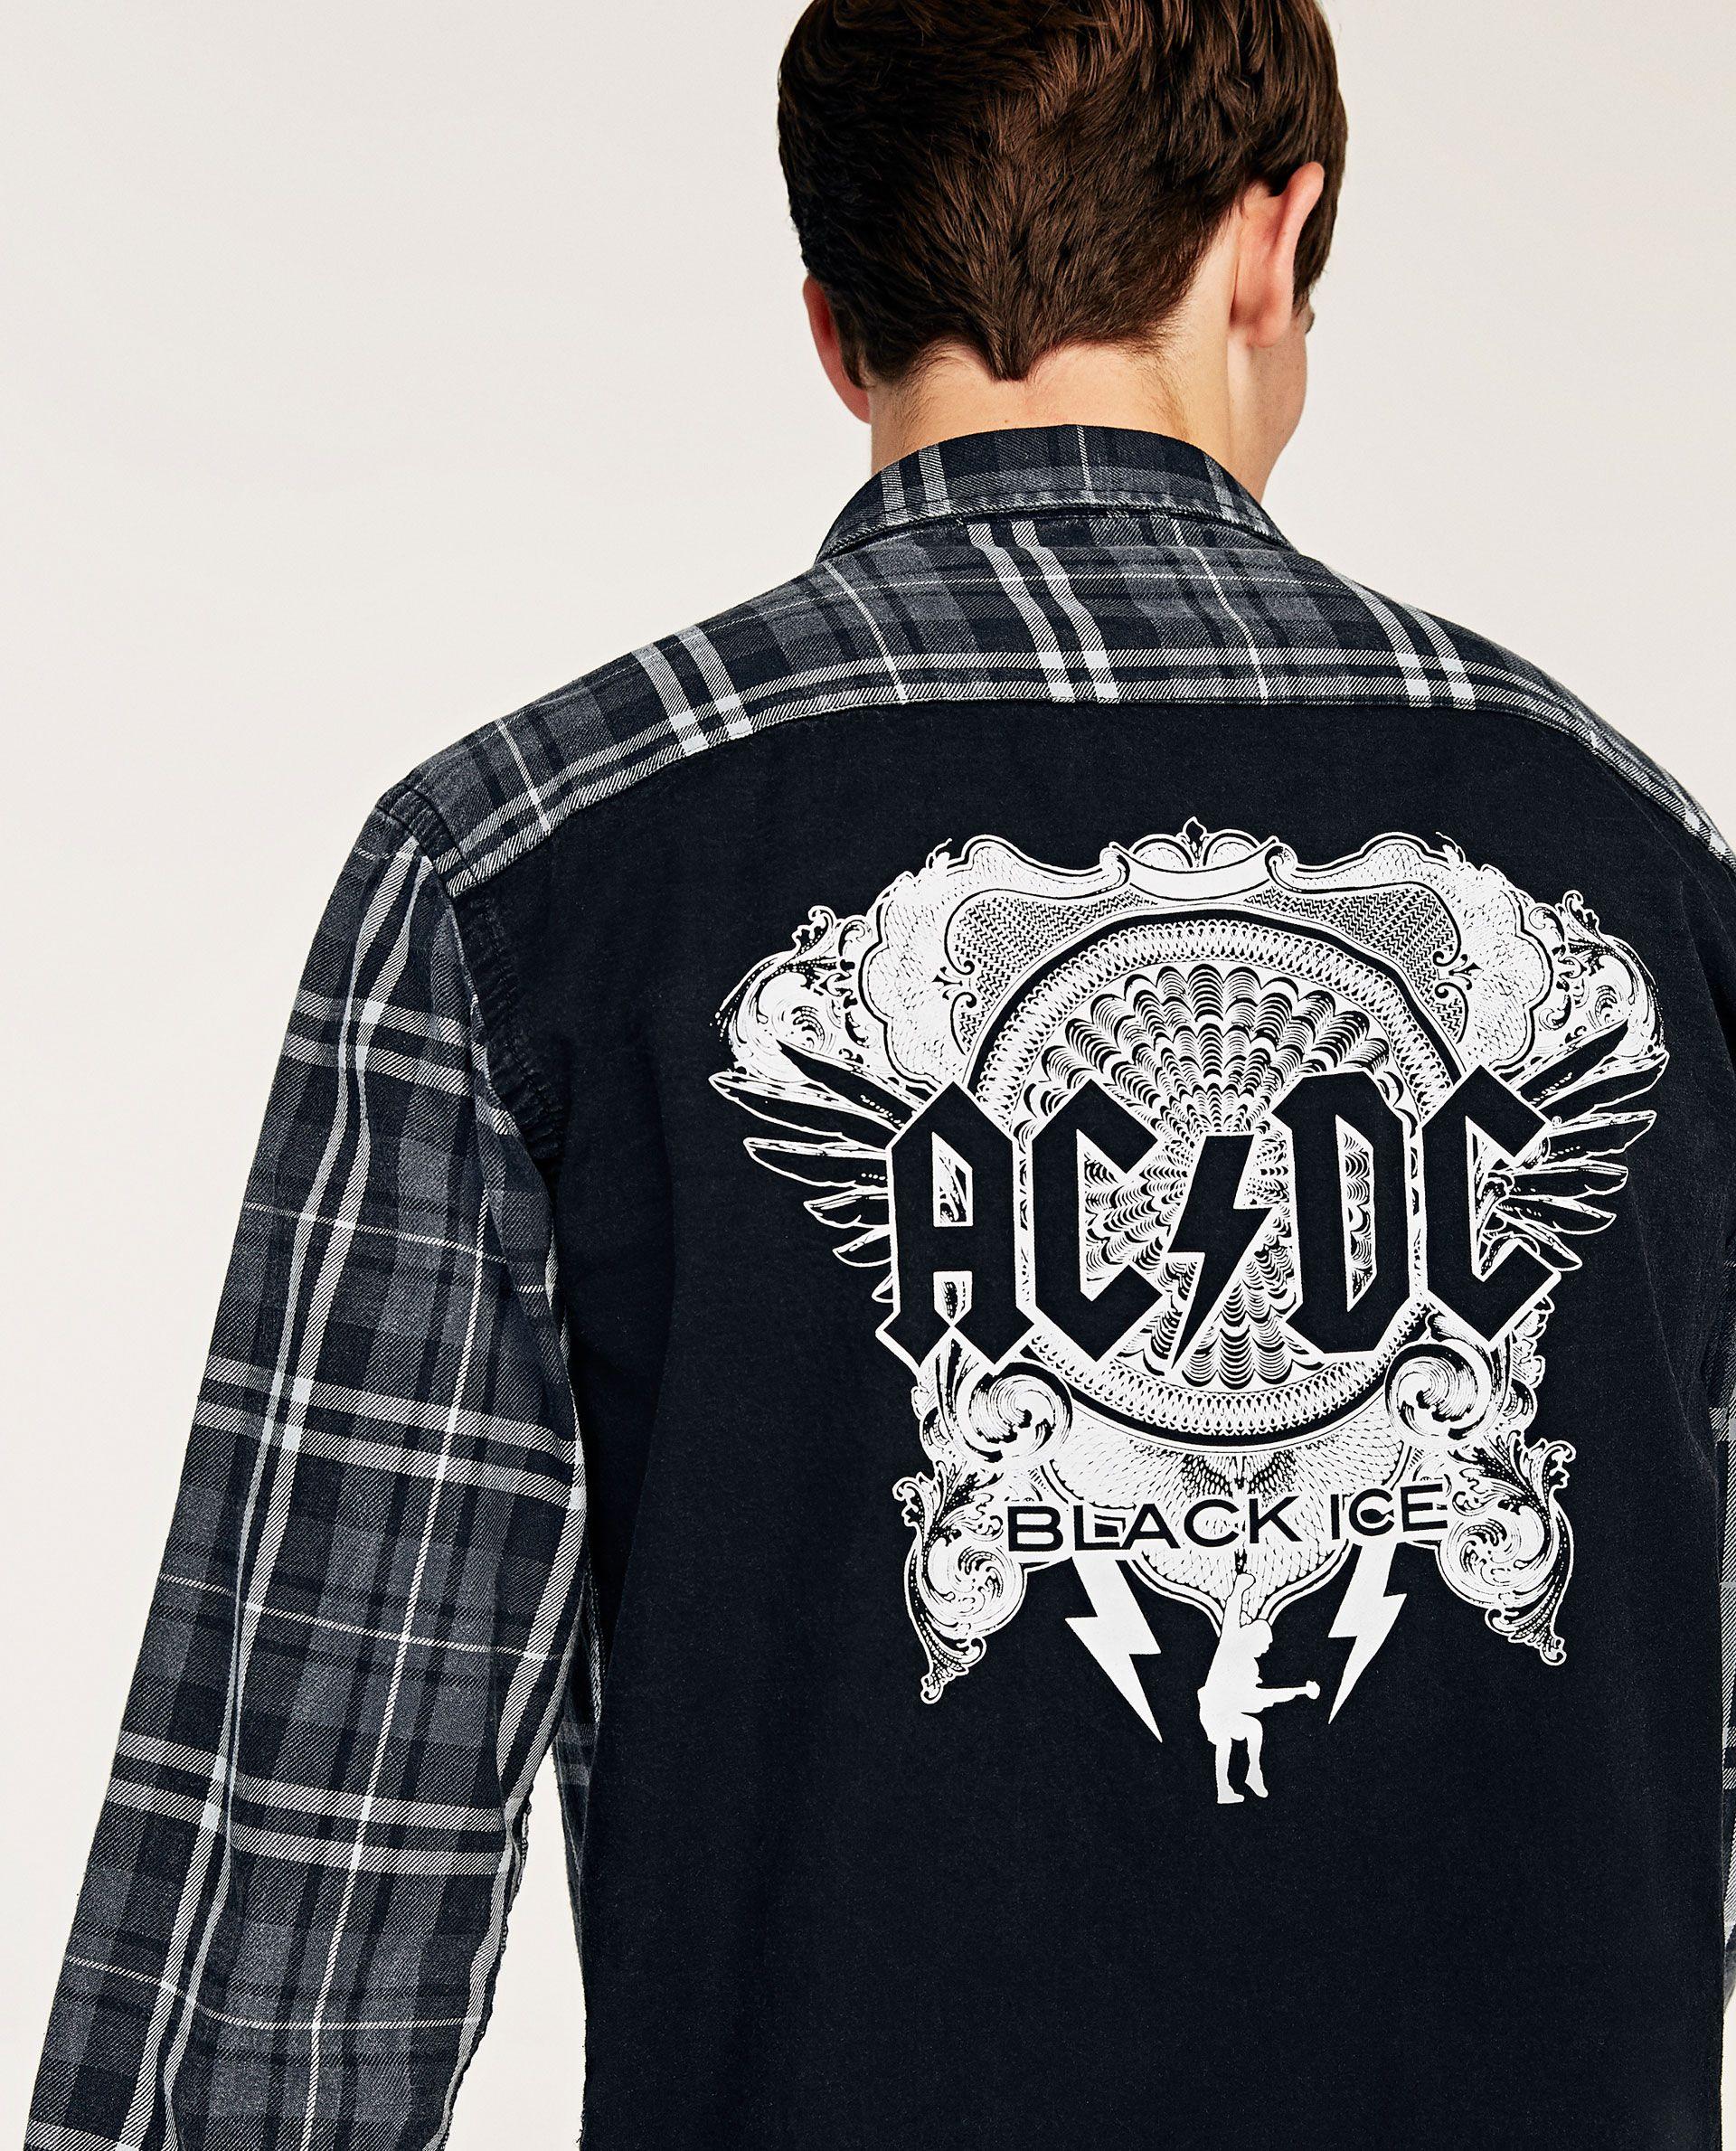 347e7b75c AC/DC' SHIRT | WAVEZONE SS18 | Shirts, Mens tops, Zara